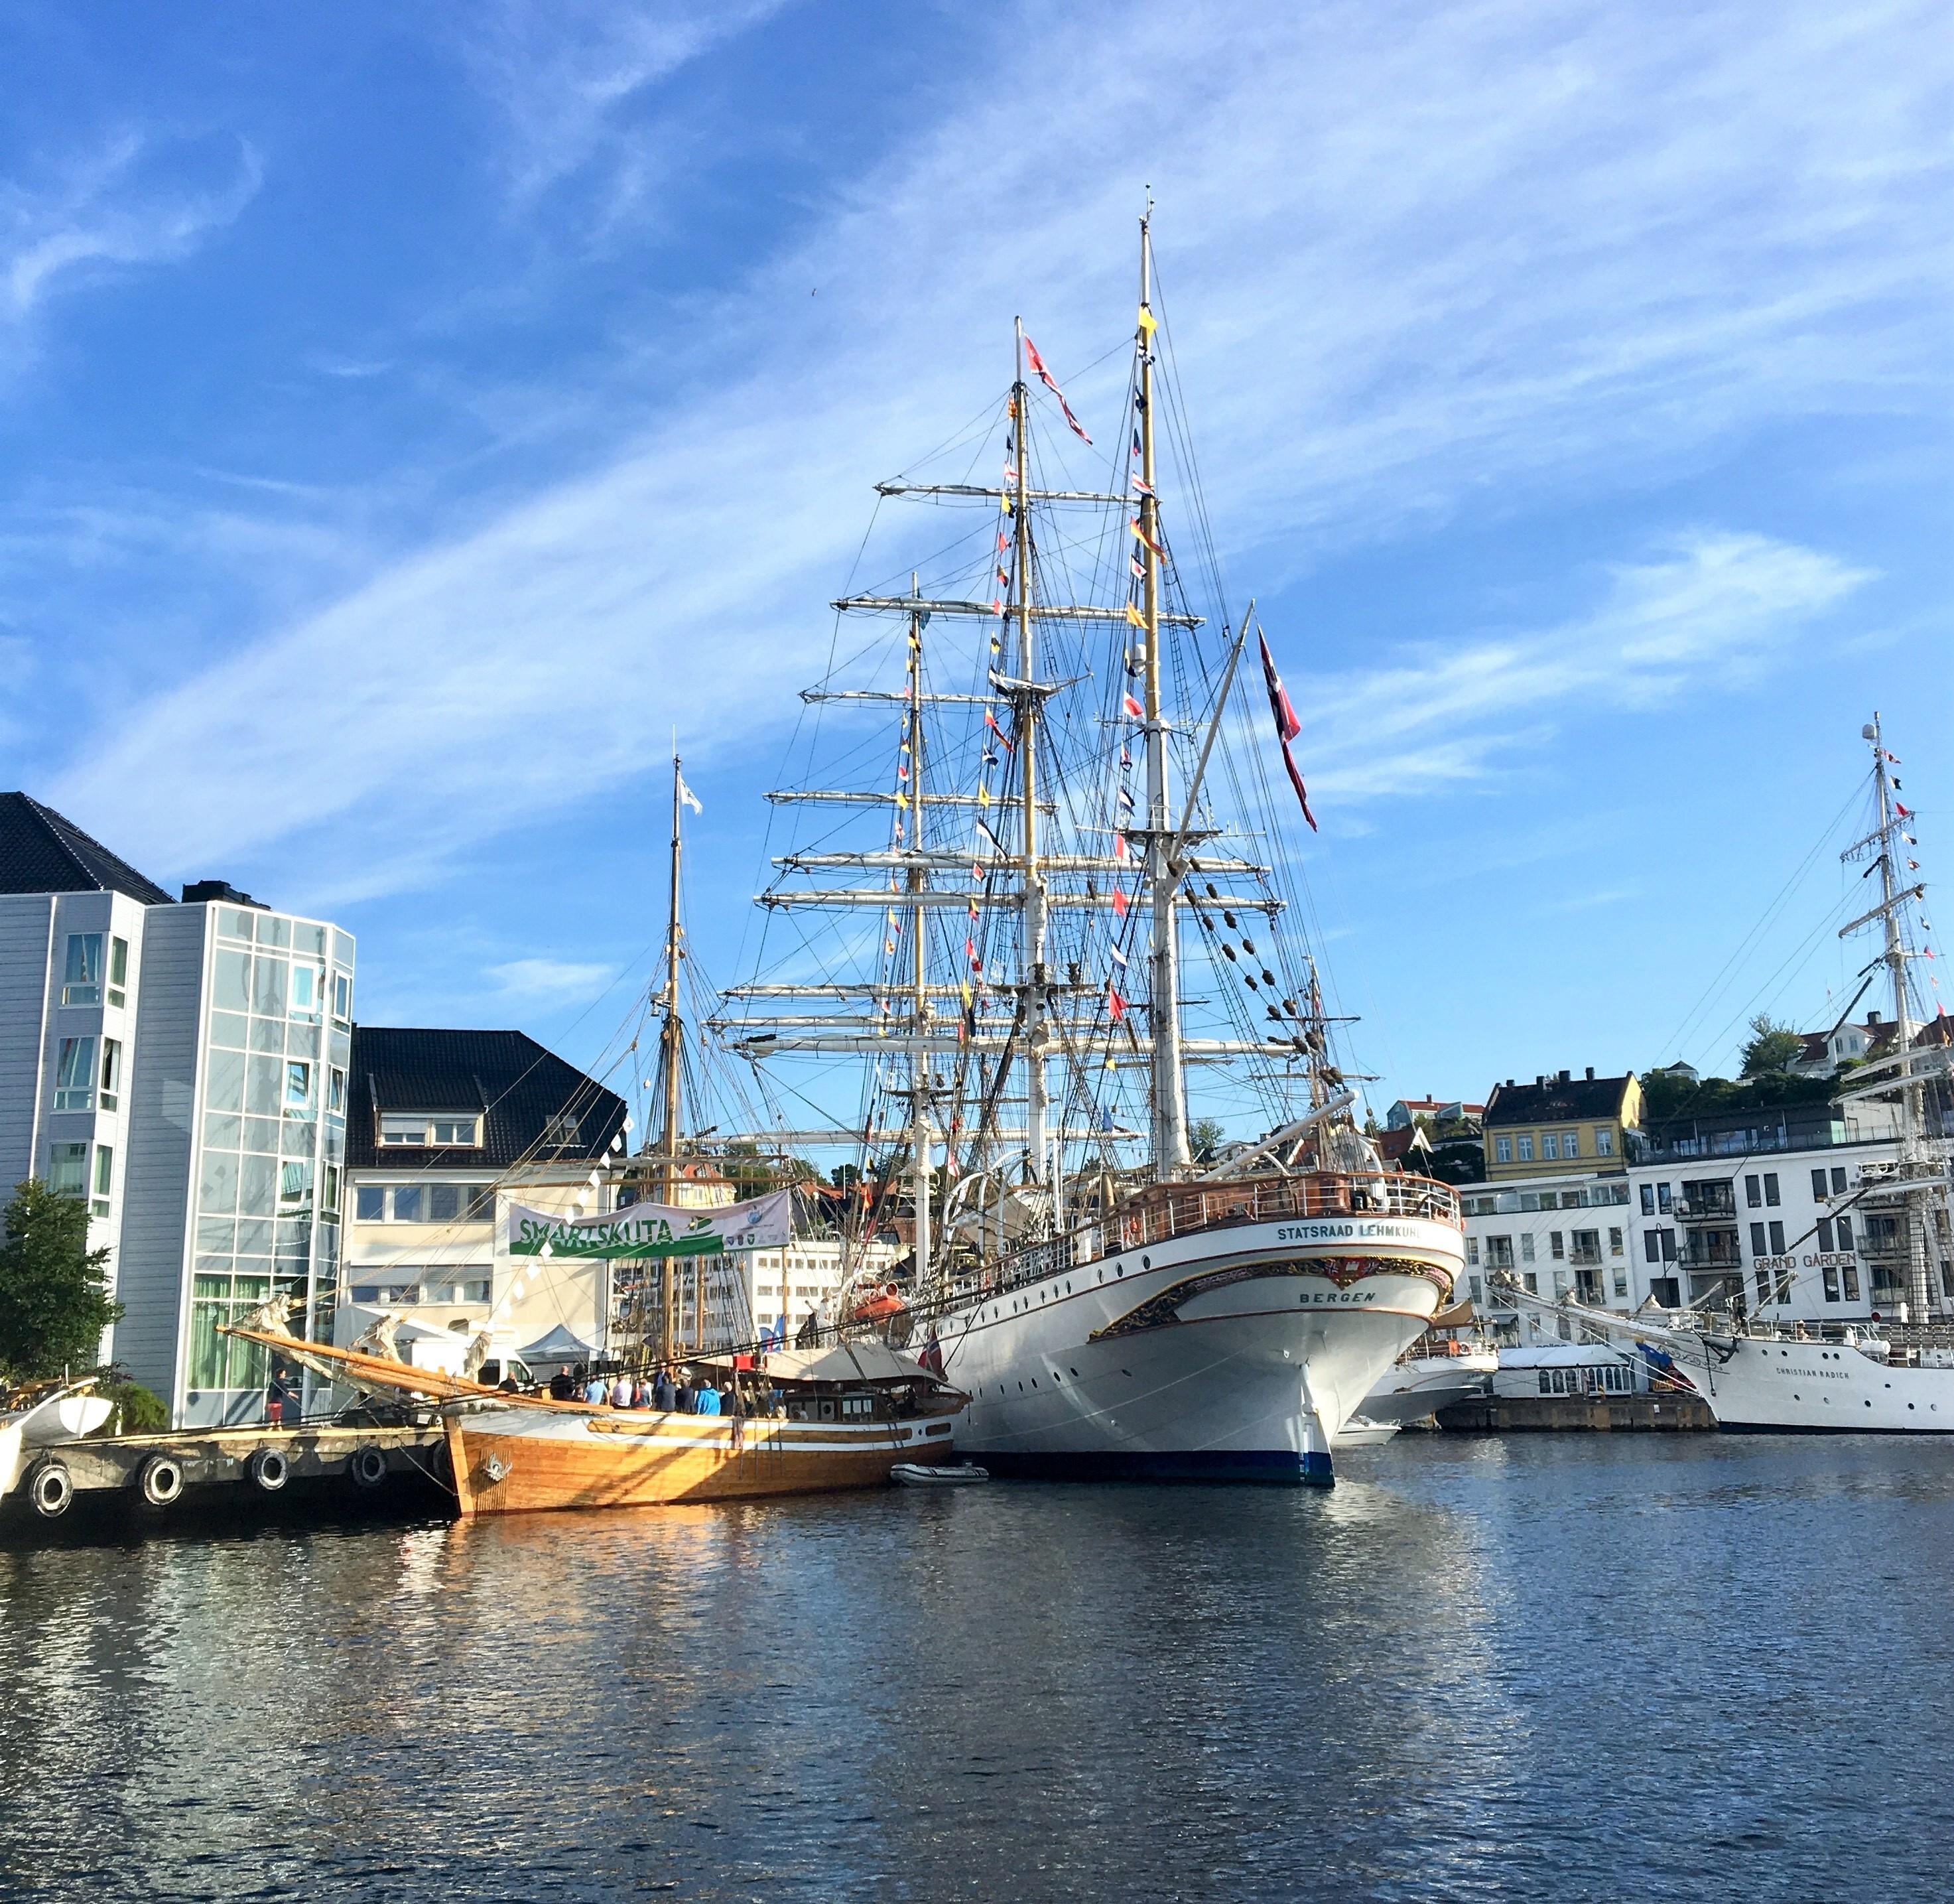 Seilskuter ligger til kai i en norsk sørlandsby.